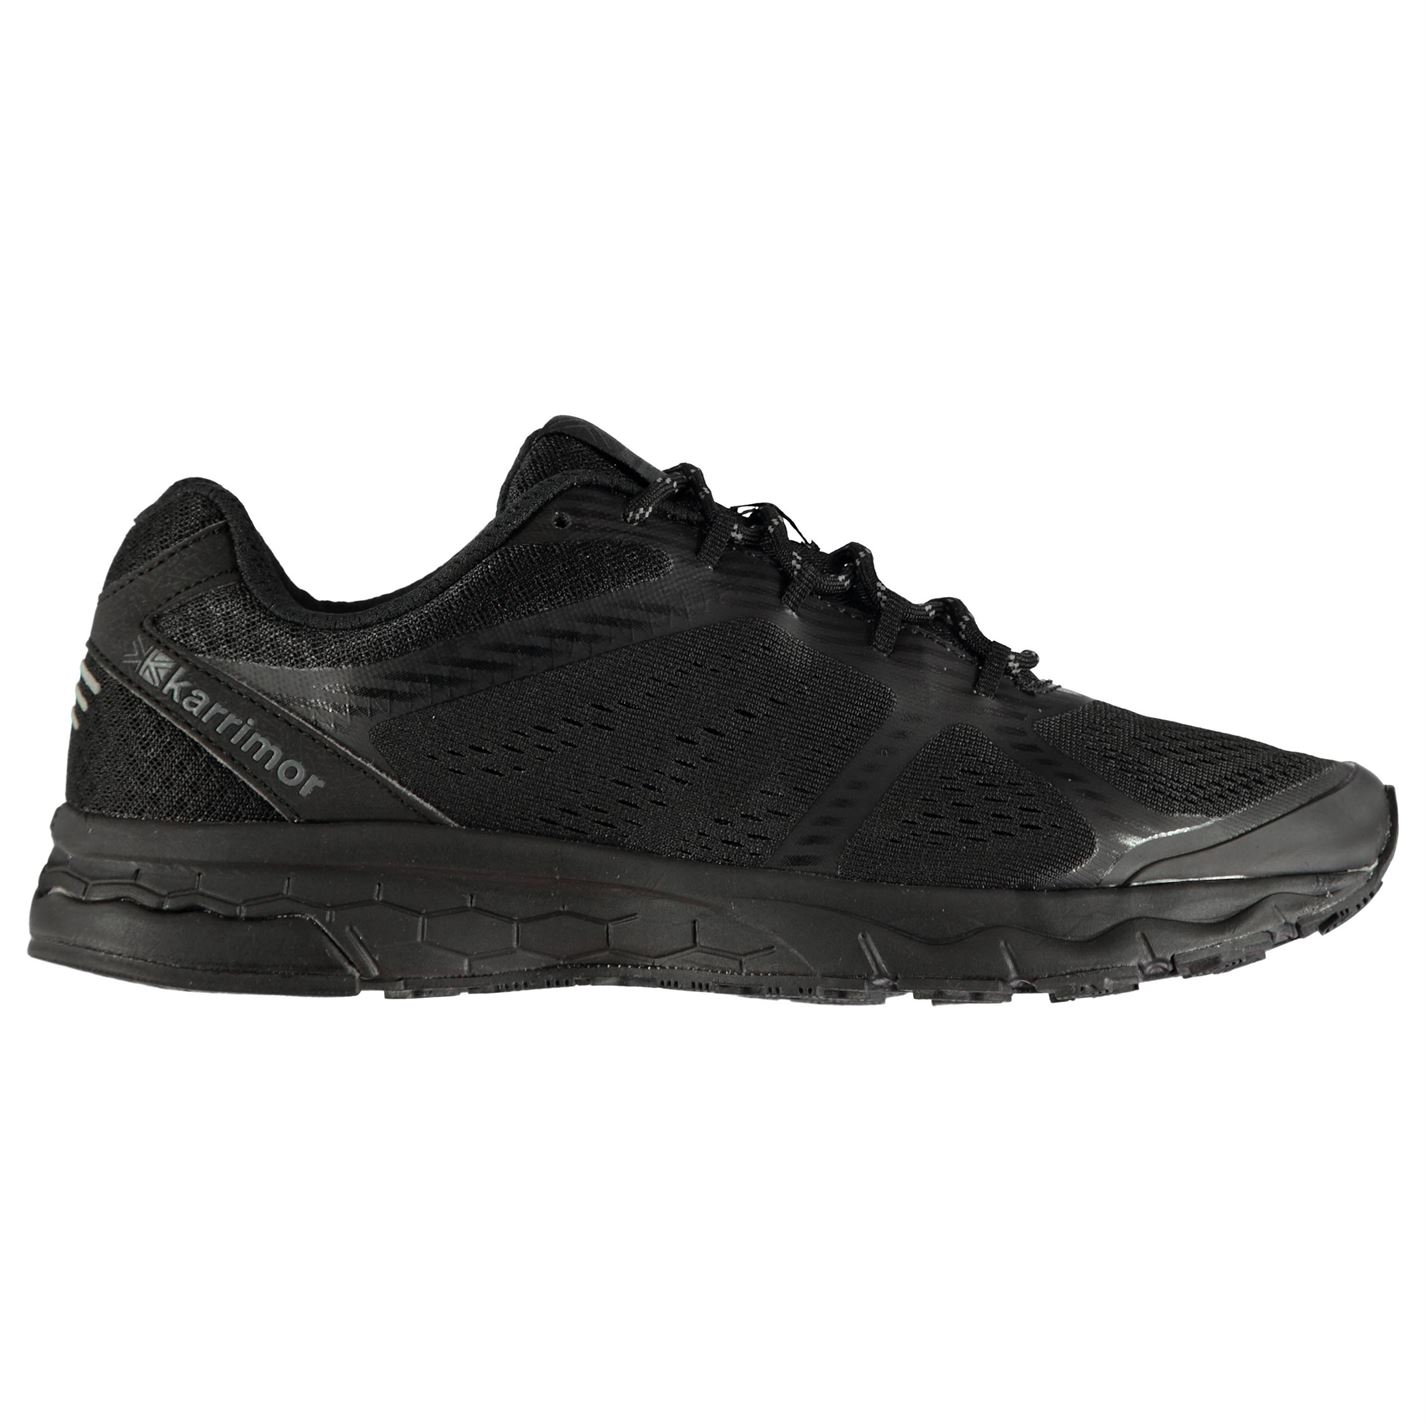 Karrimor Tempo 5 Mens Running Shoes Black 1183d0de82a